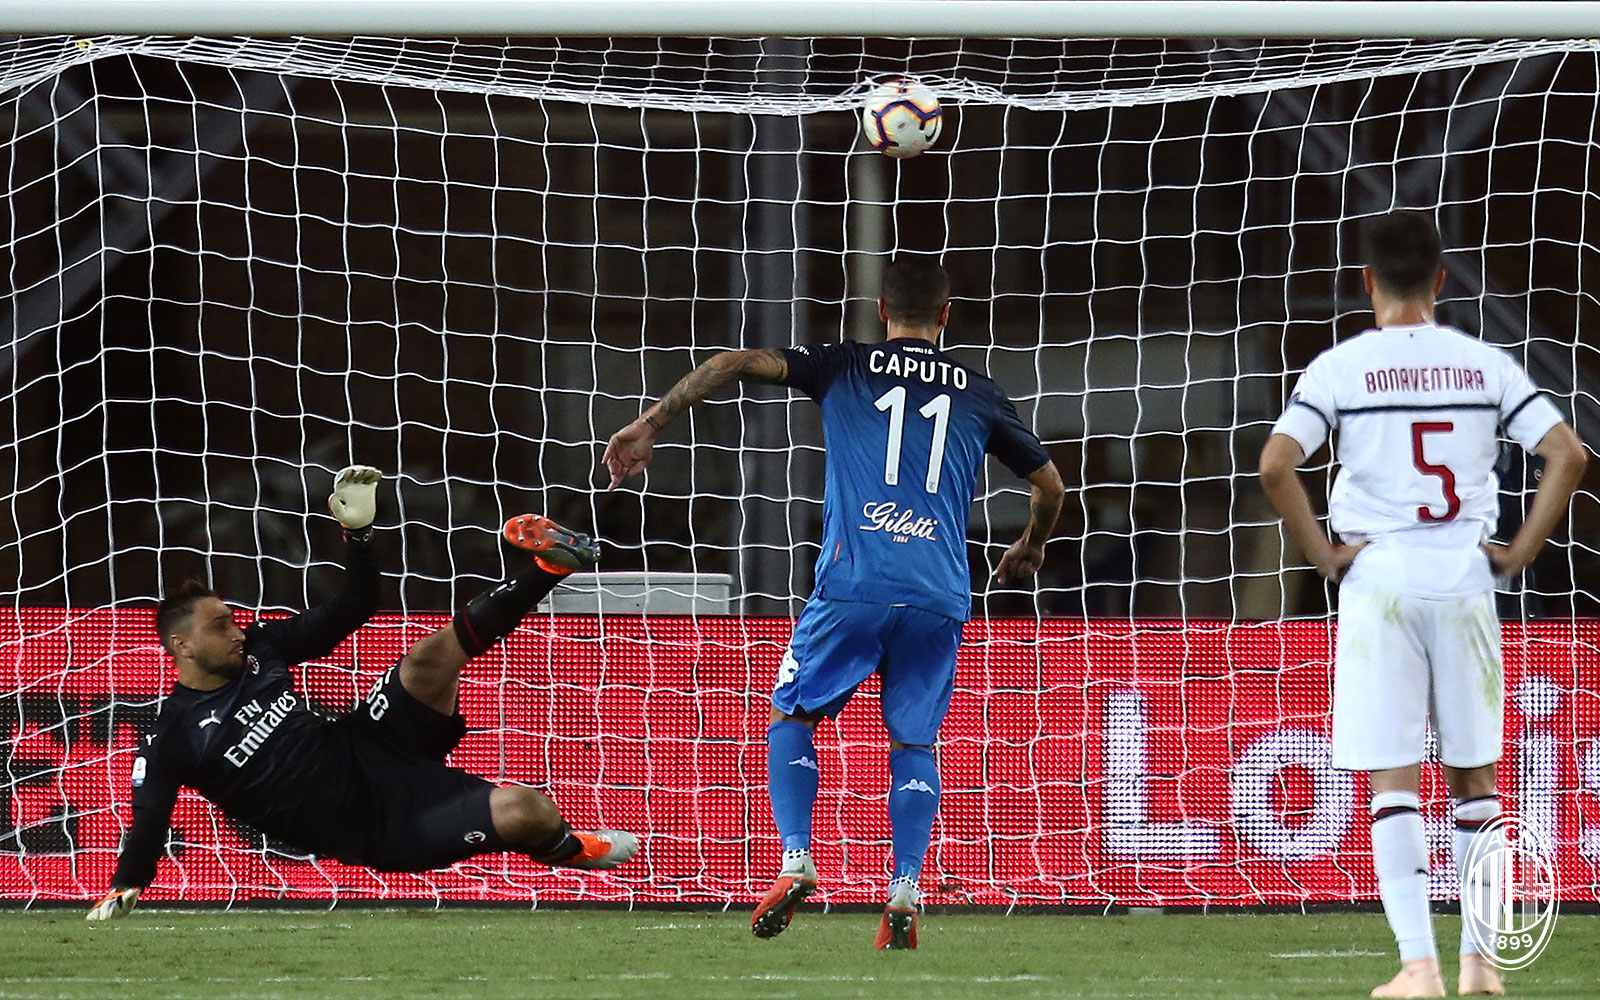 Francesco Caputo scoring a penalty during Empoli-Milan at Stadio Carlo Castellani on September 27, 2018. (@acmilan.com)